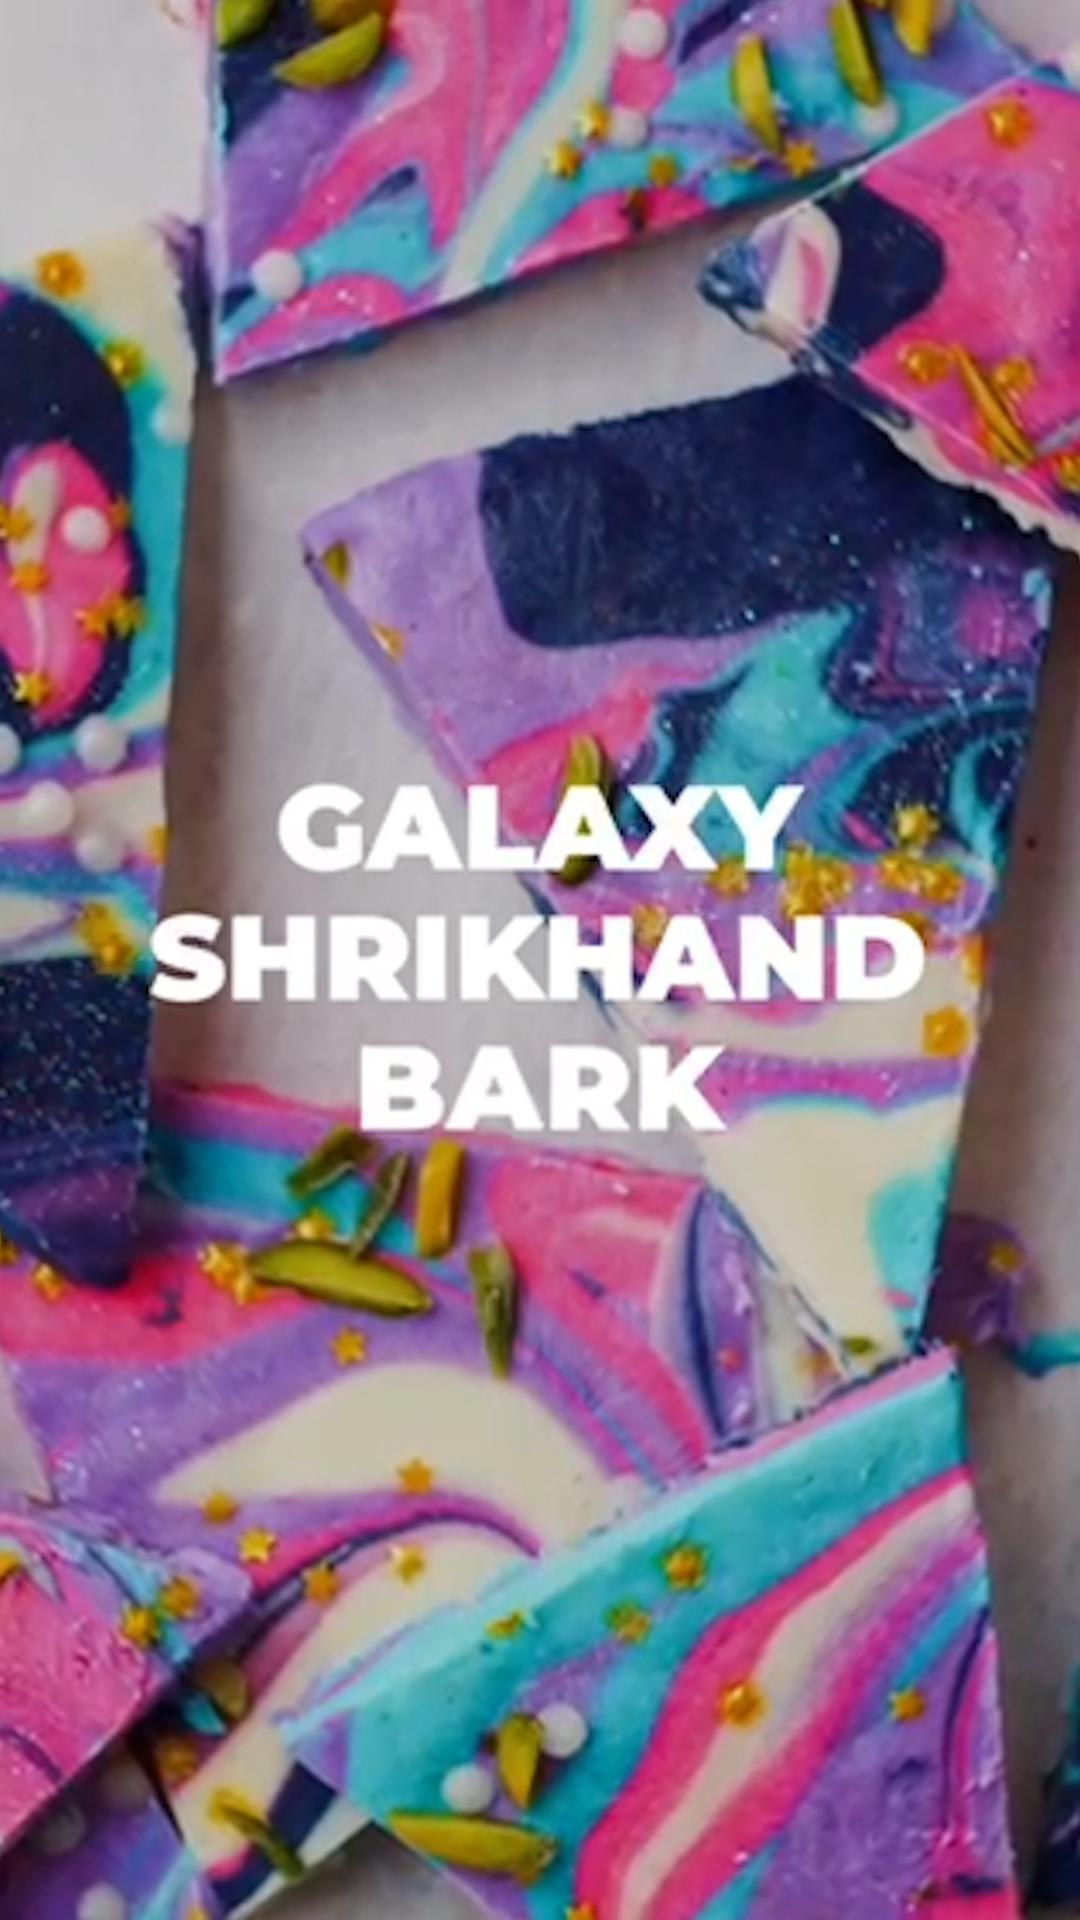 Galaxy Shrikhand Bark